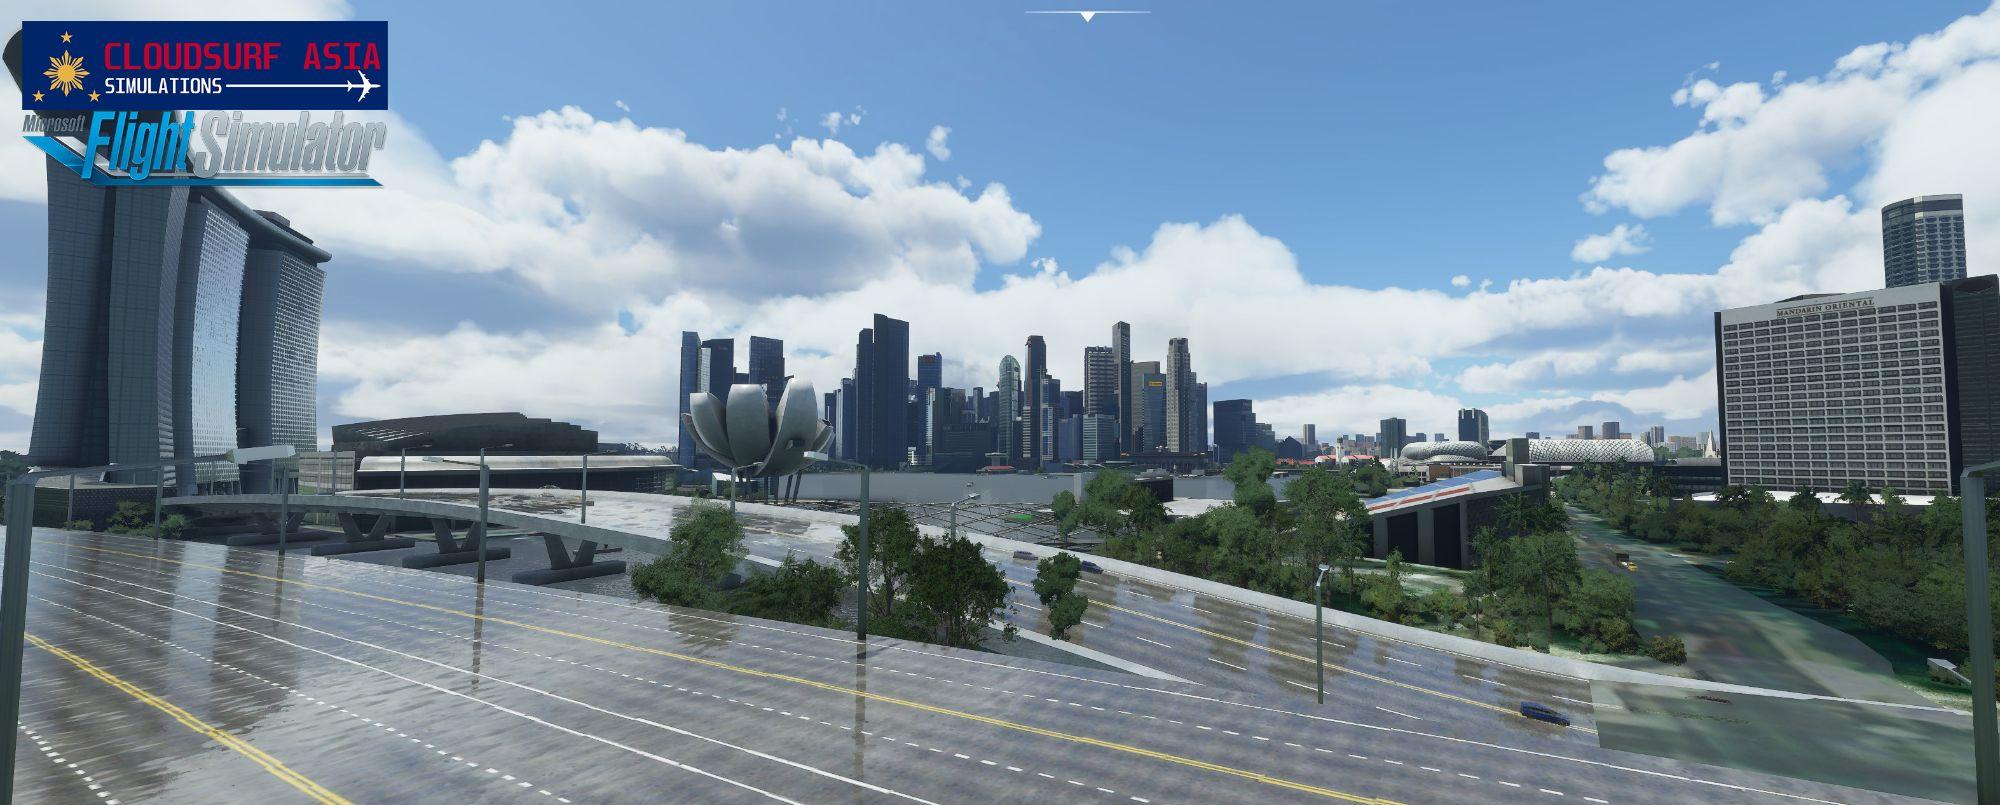 SINGAPOREDT1.jpg